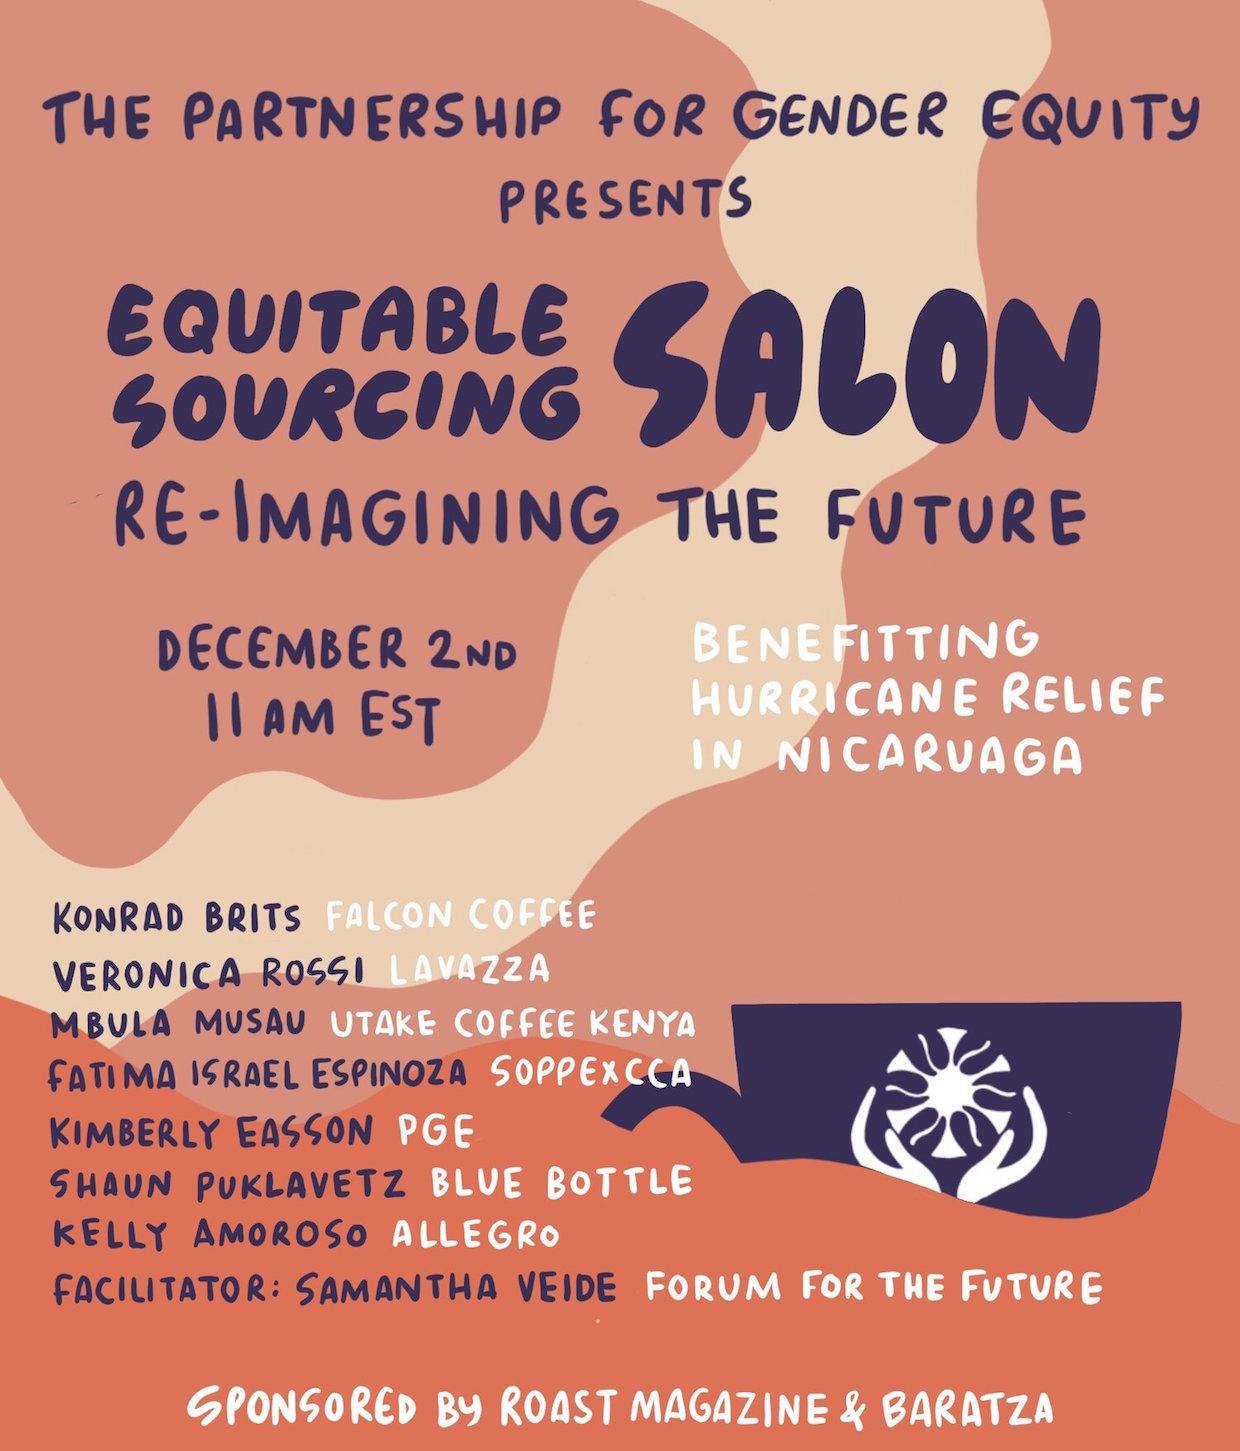 Partnership for Gender Equity Equitable Sourcing Salon